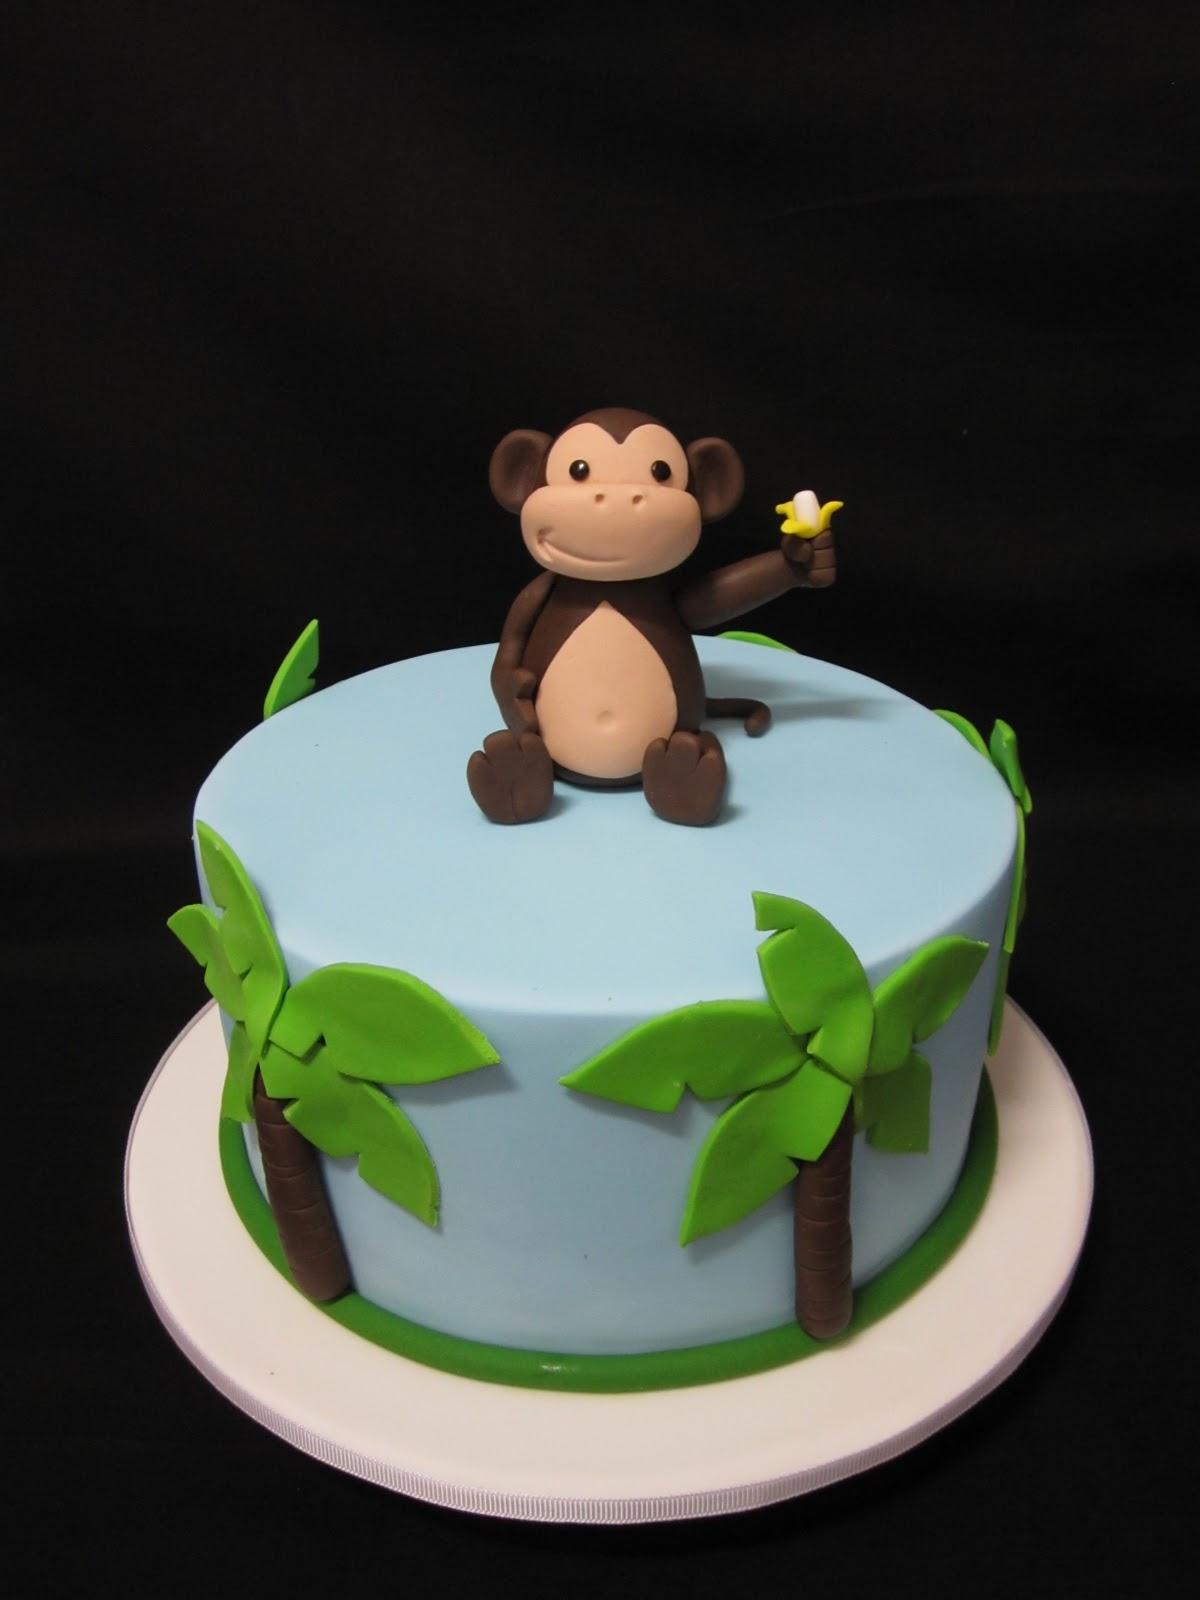 Handi's Cakes: October 2010